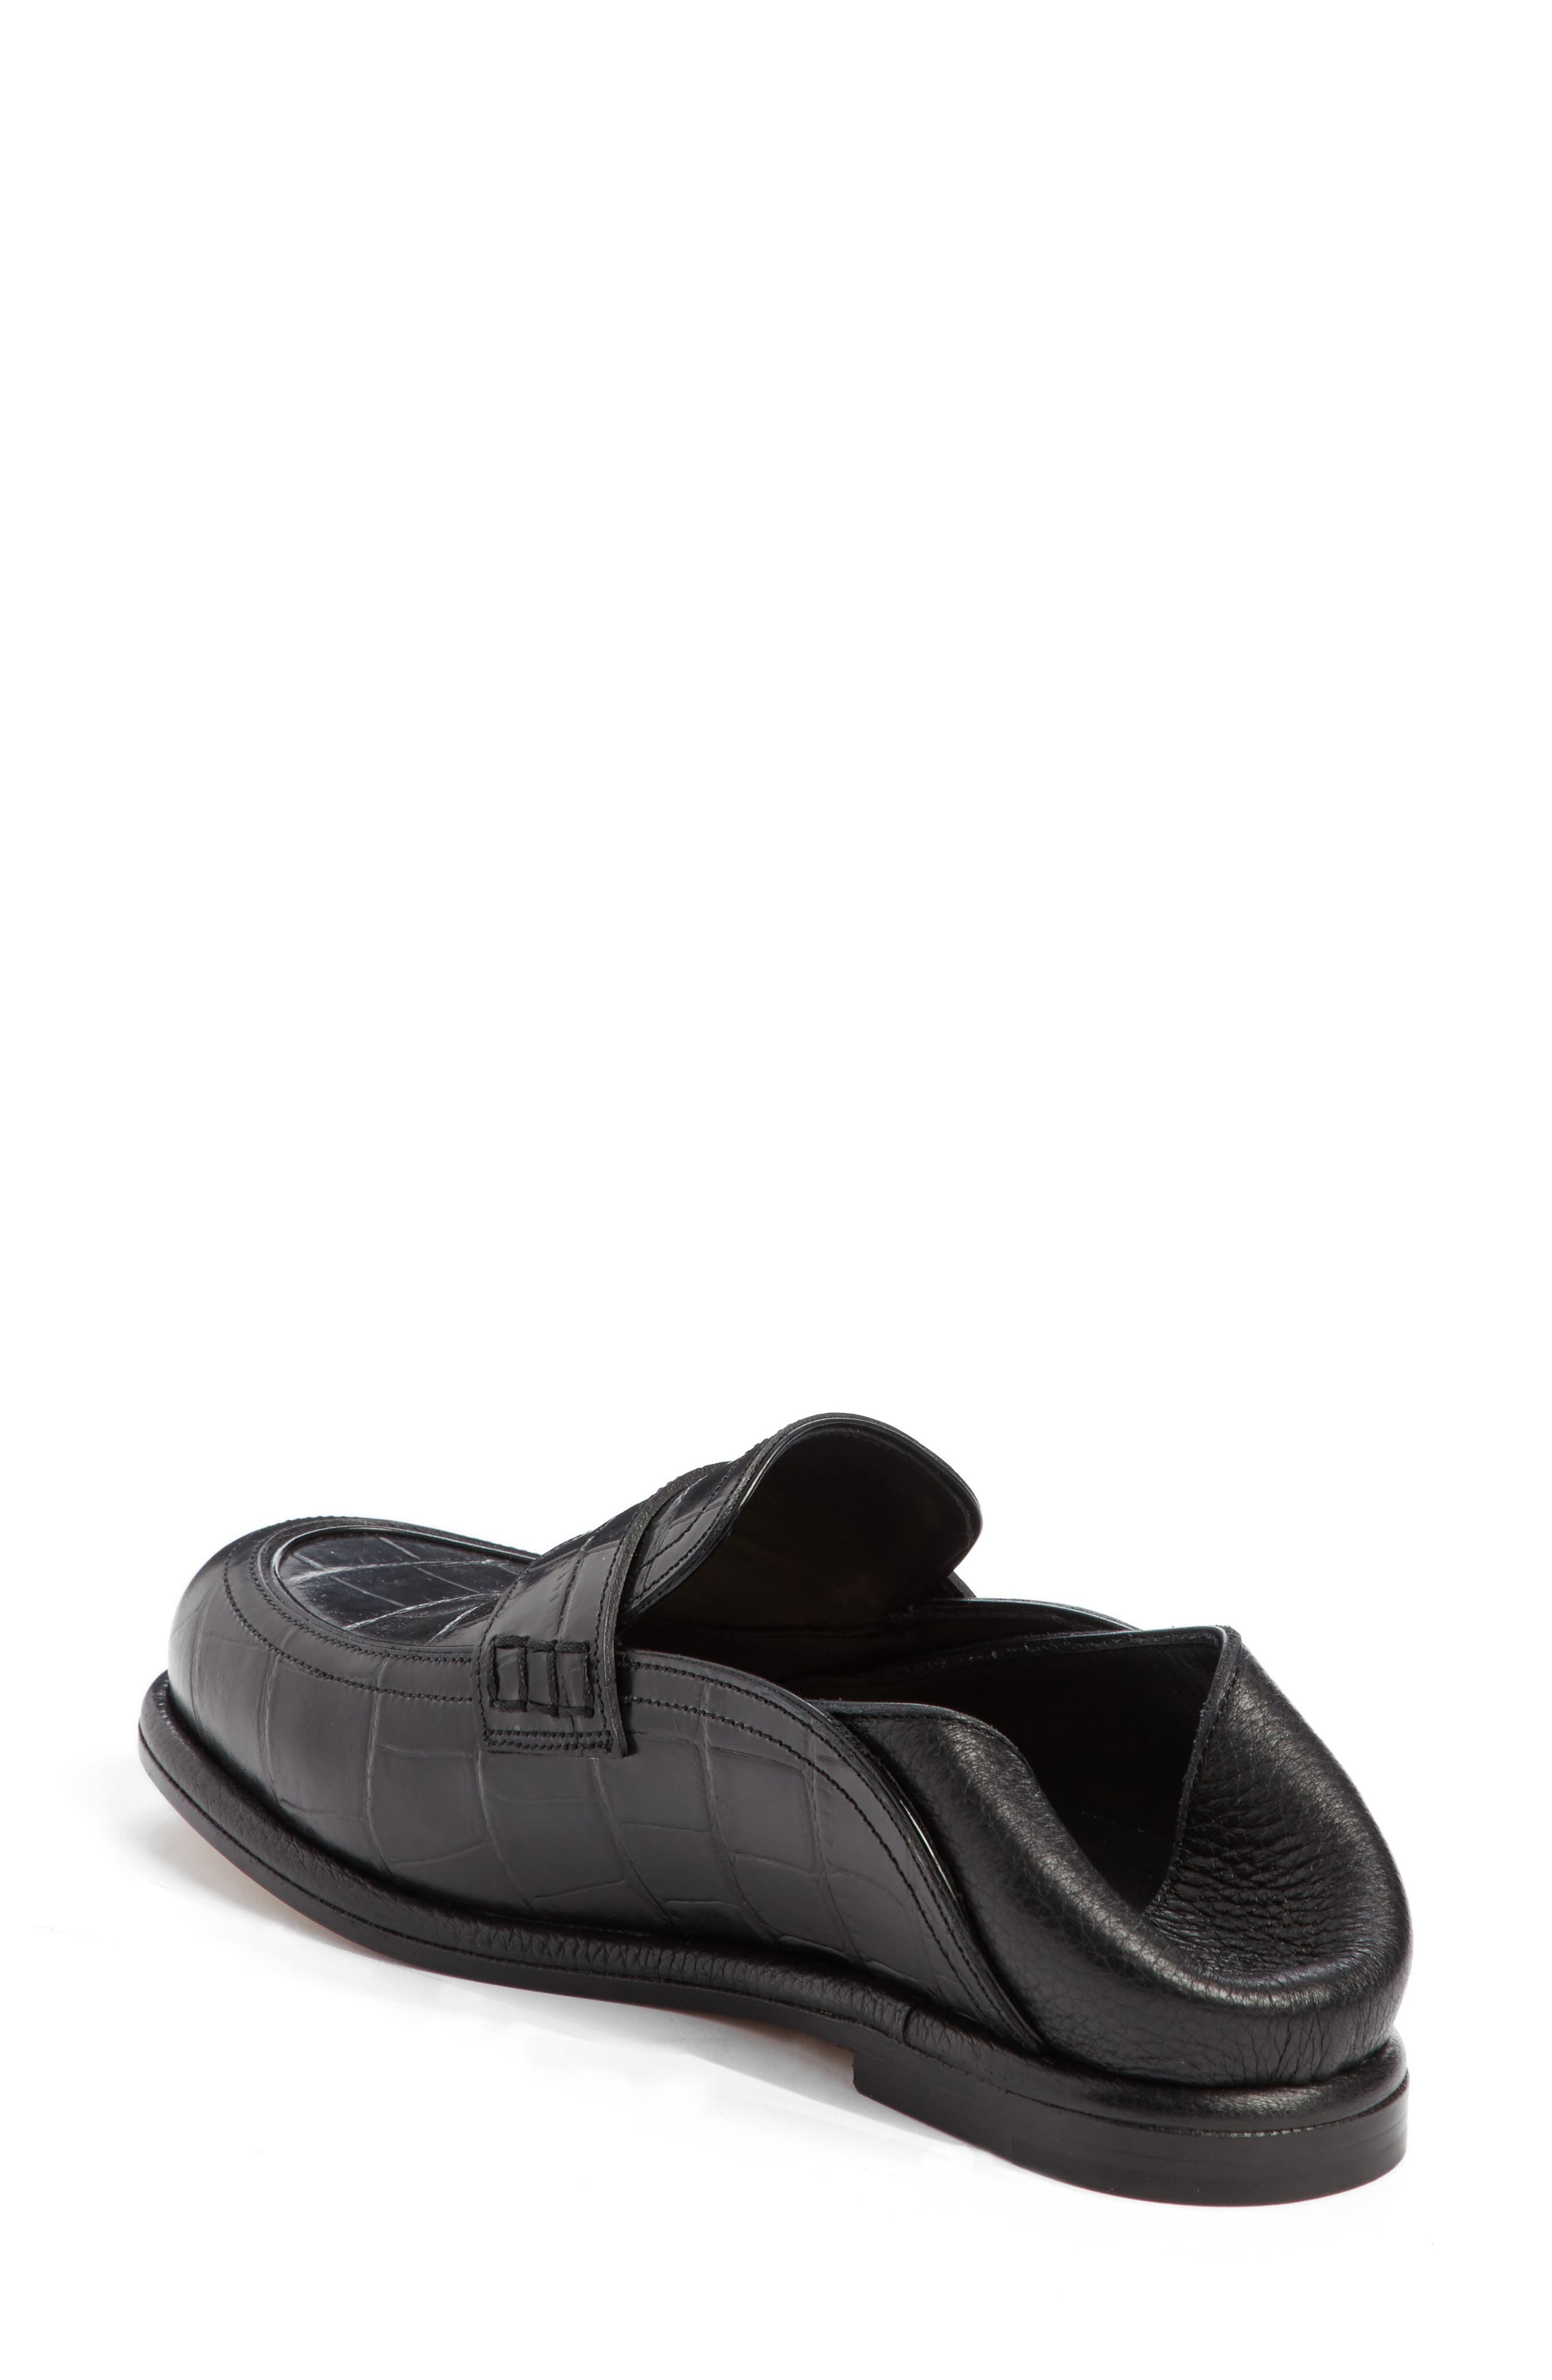 Croc Embossed Convertible Loafer,                             Alternate thumbnail 3, color,                             Black